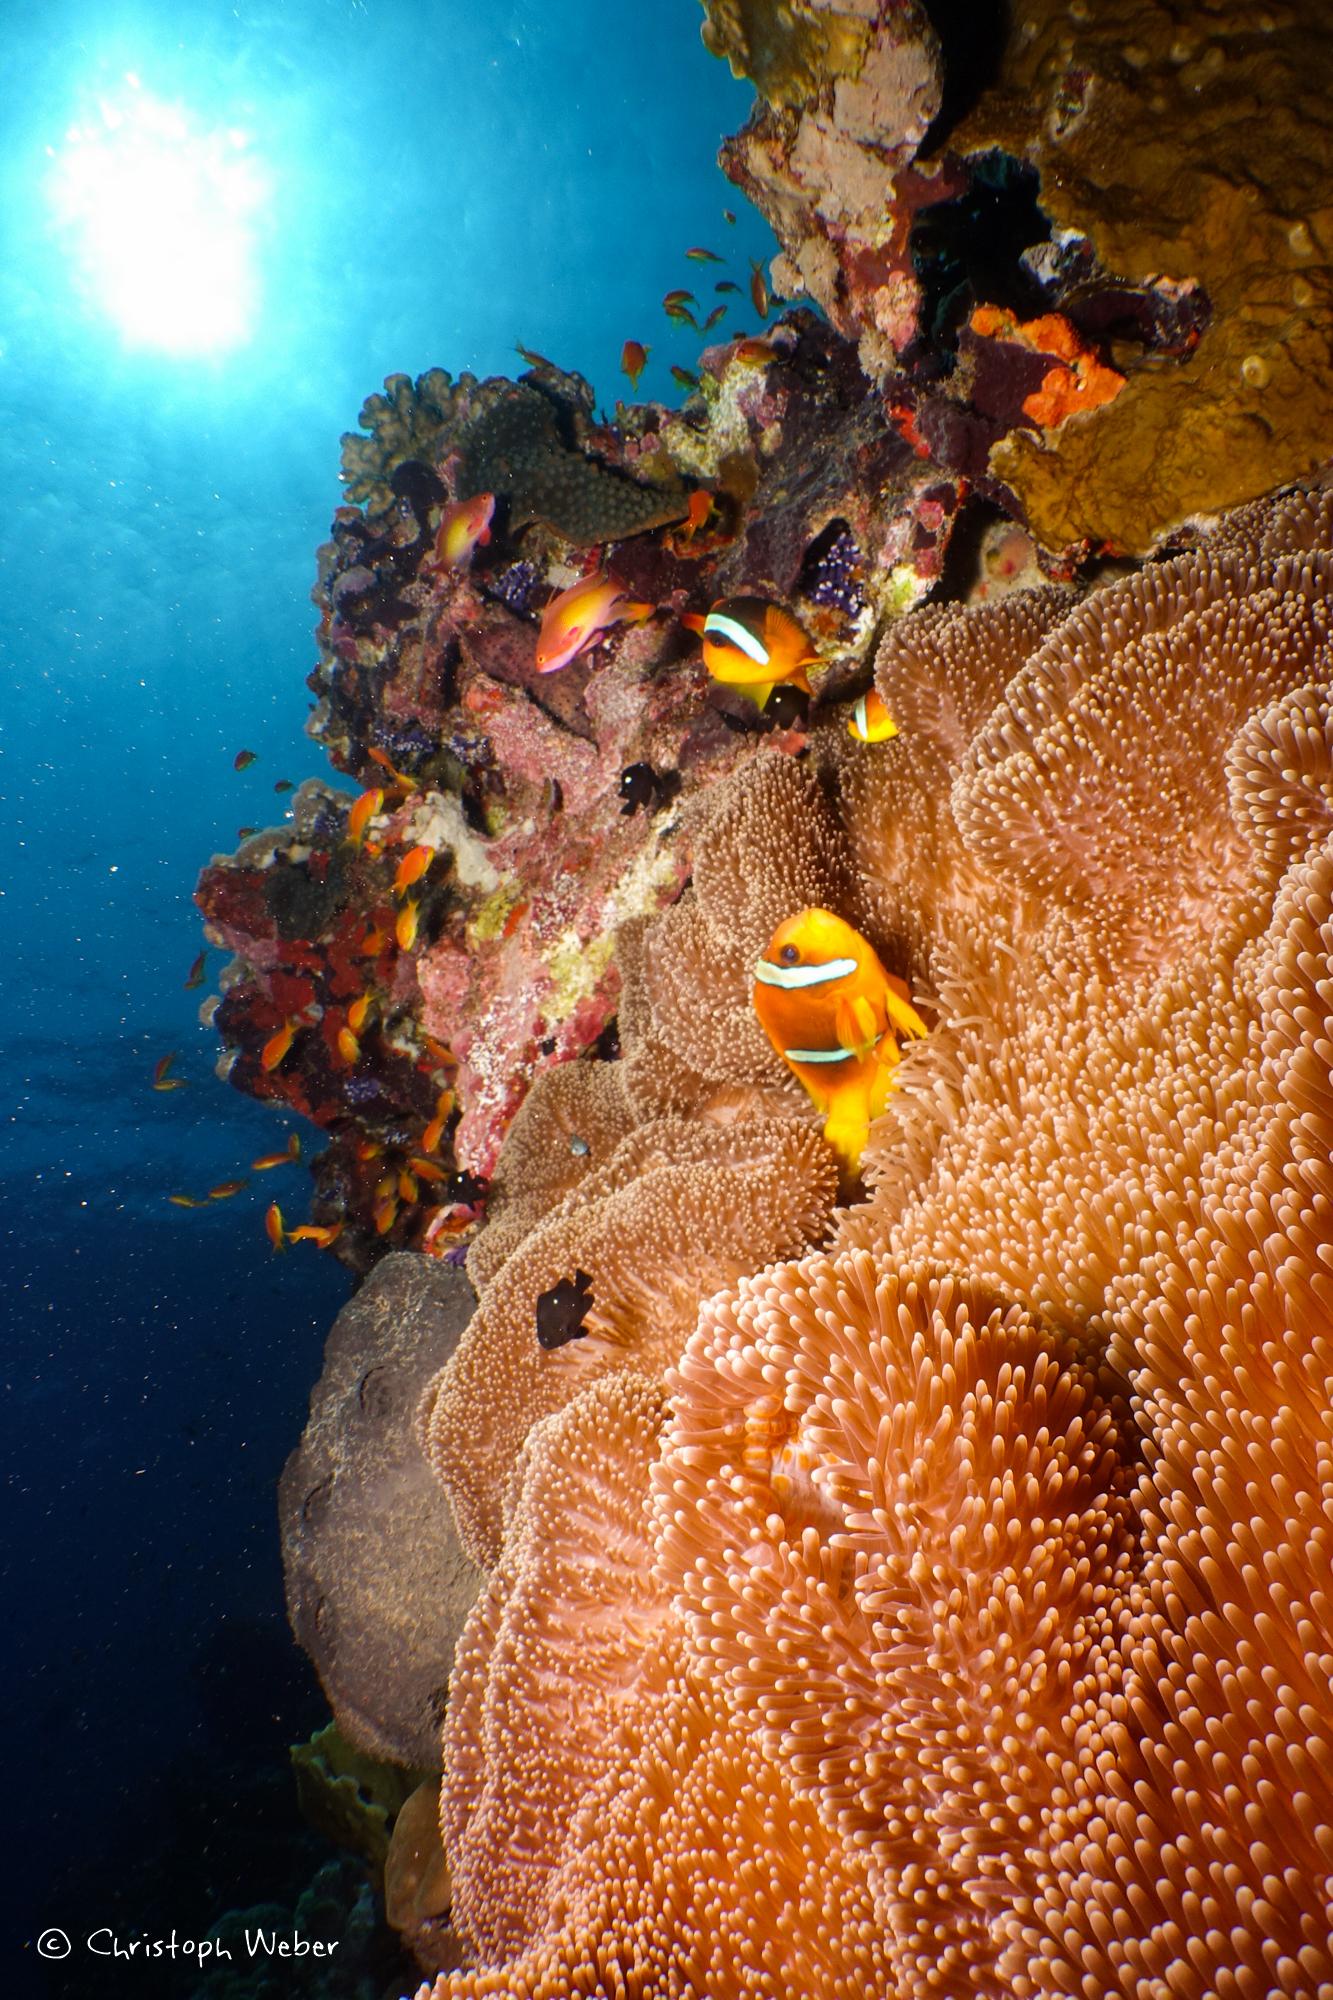 Clown fish dance - Clown fish and anemones